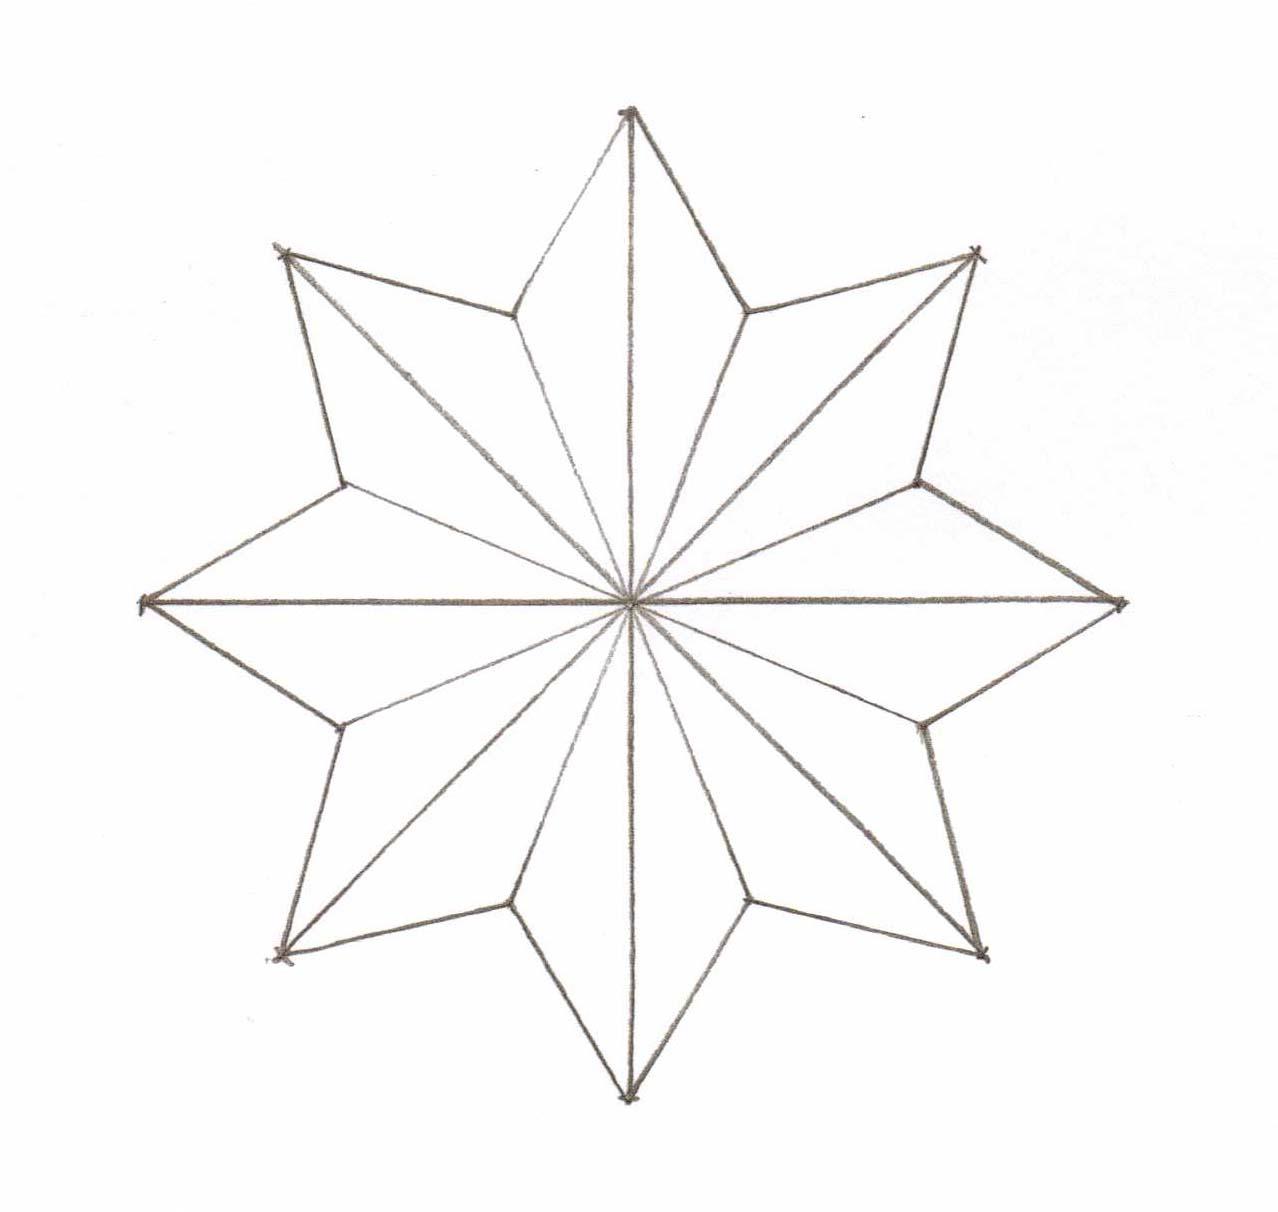 1278x1212 Star Outline Printable Collection